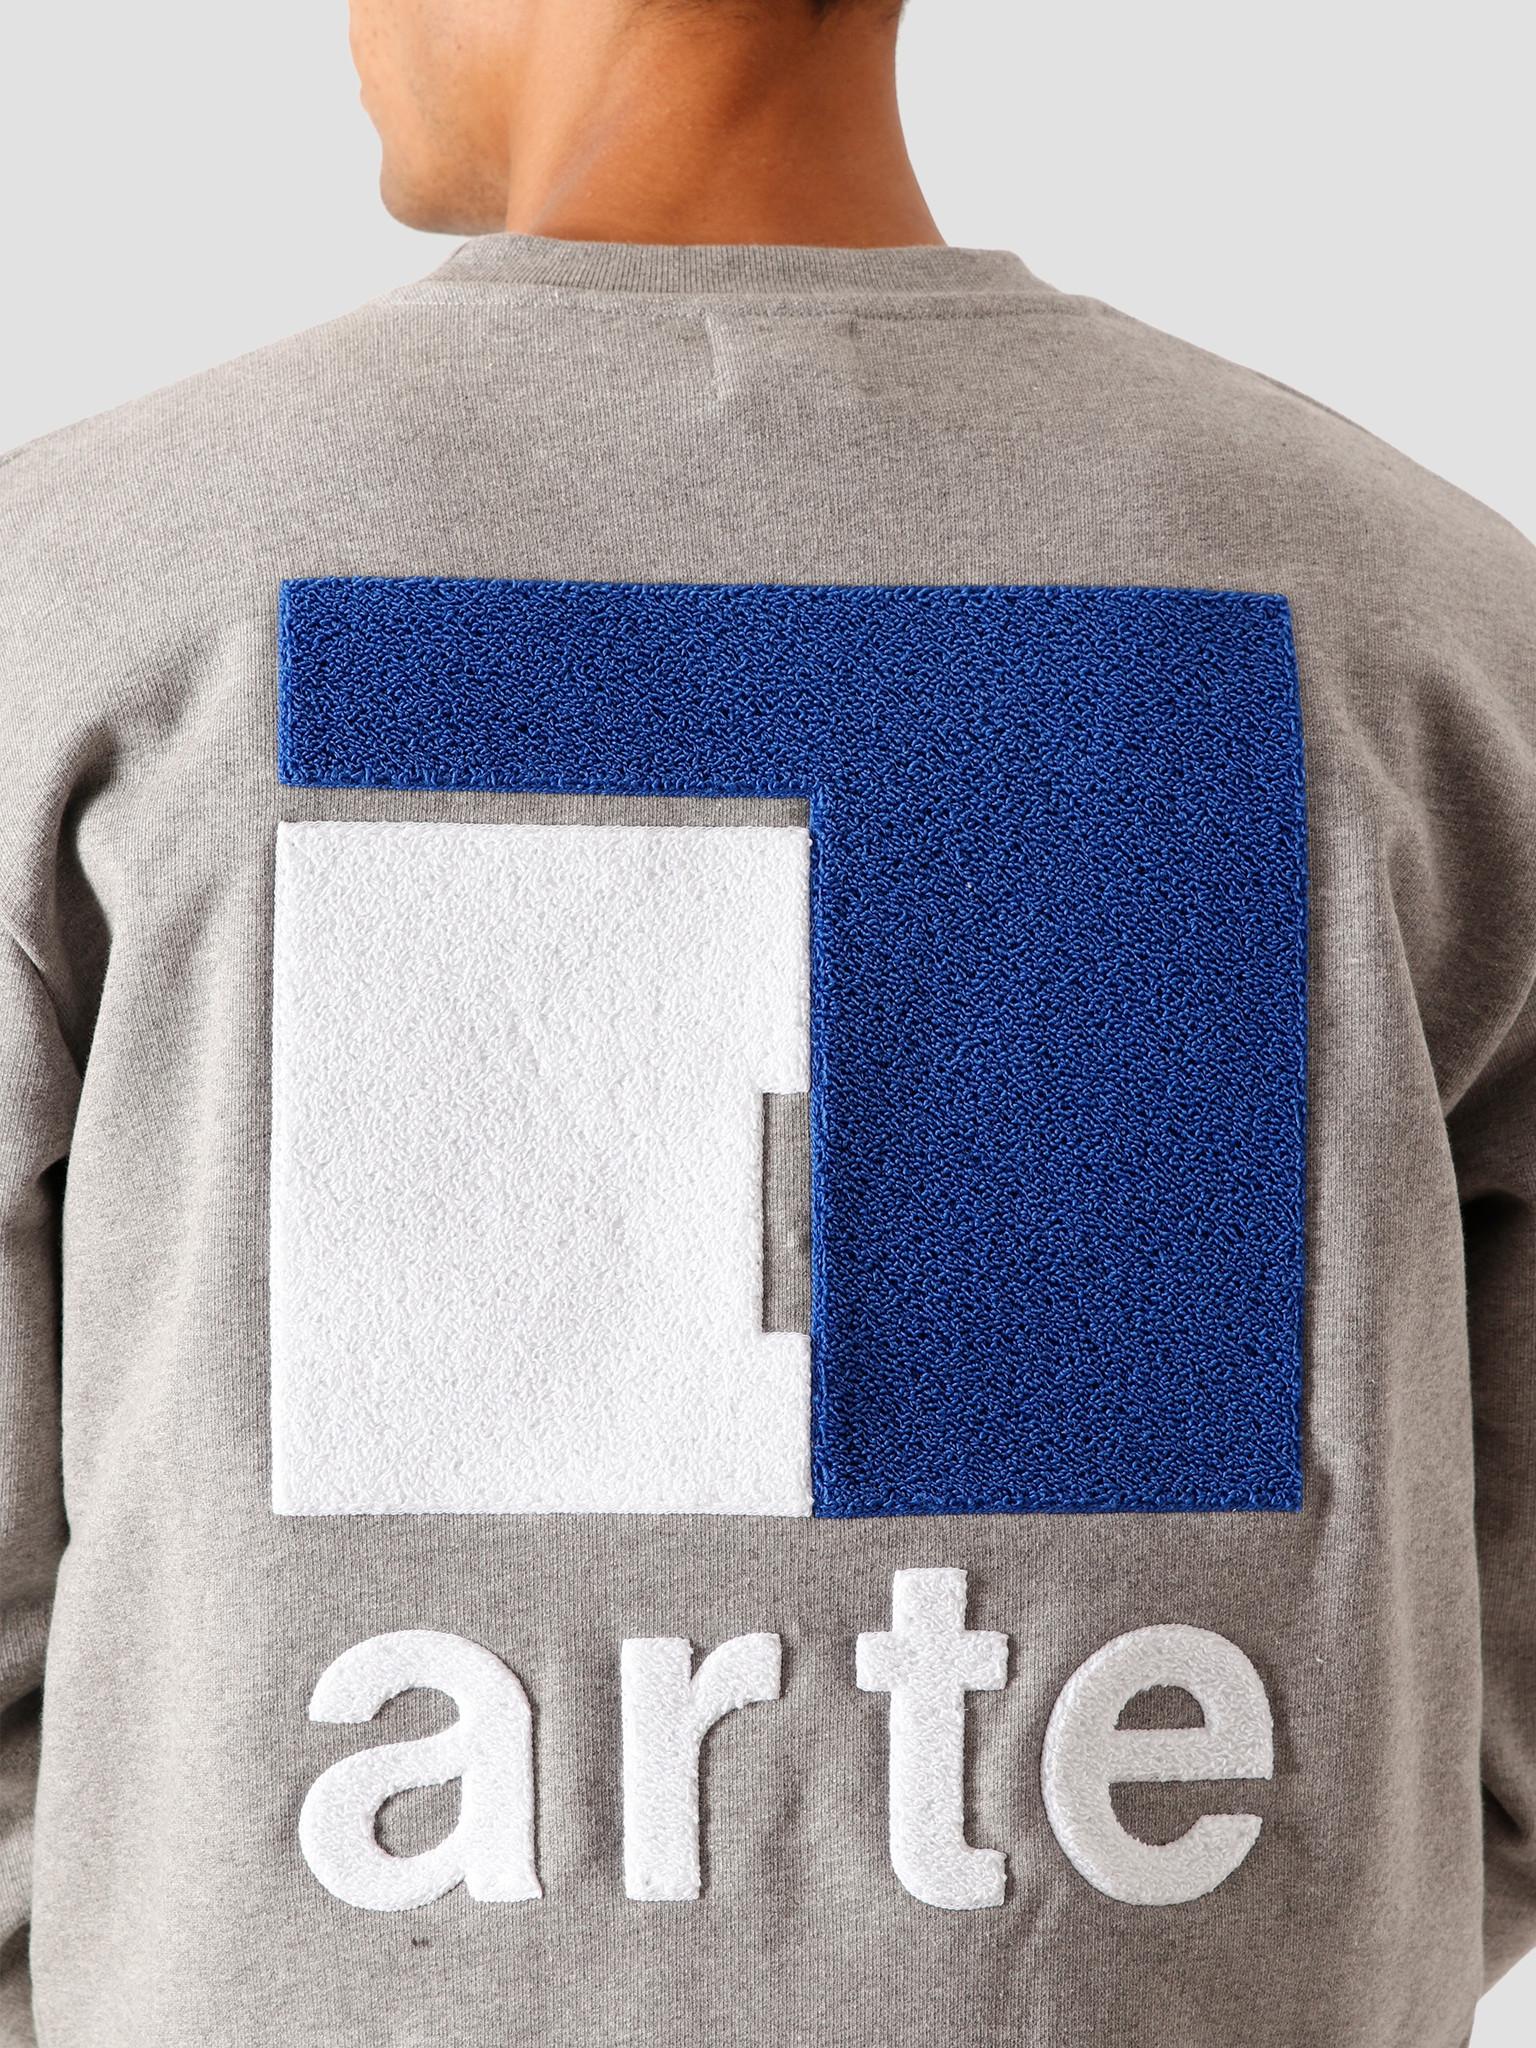 Arte Antwerp Arte Antwerp Chuck A Back Sweater Grey AW20-045C